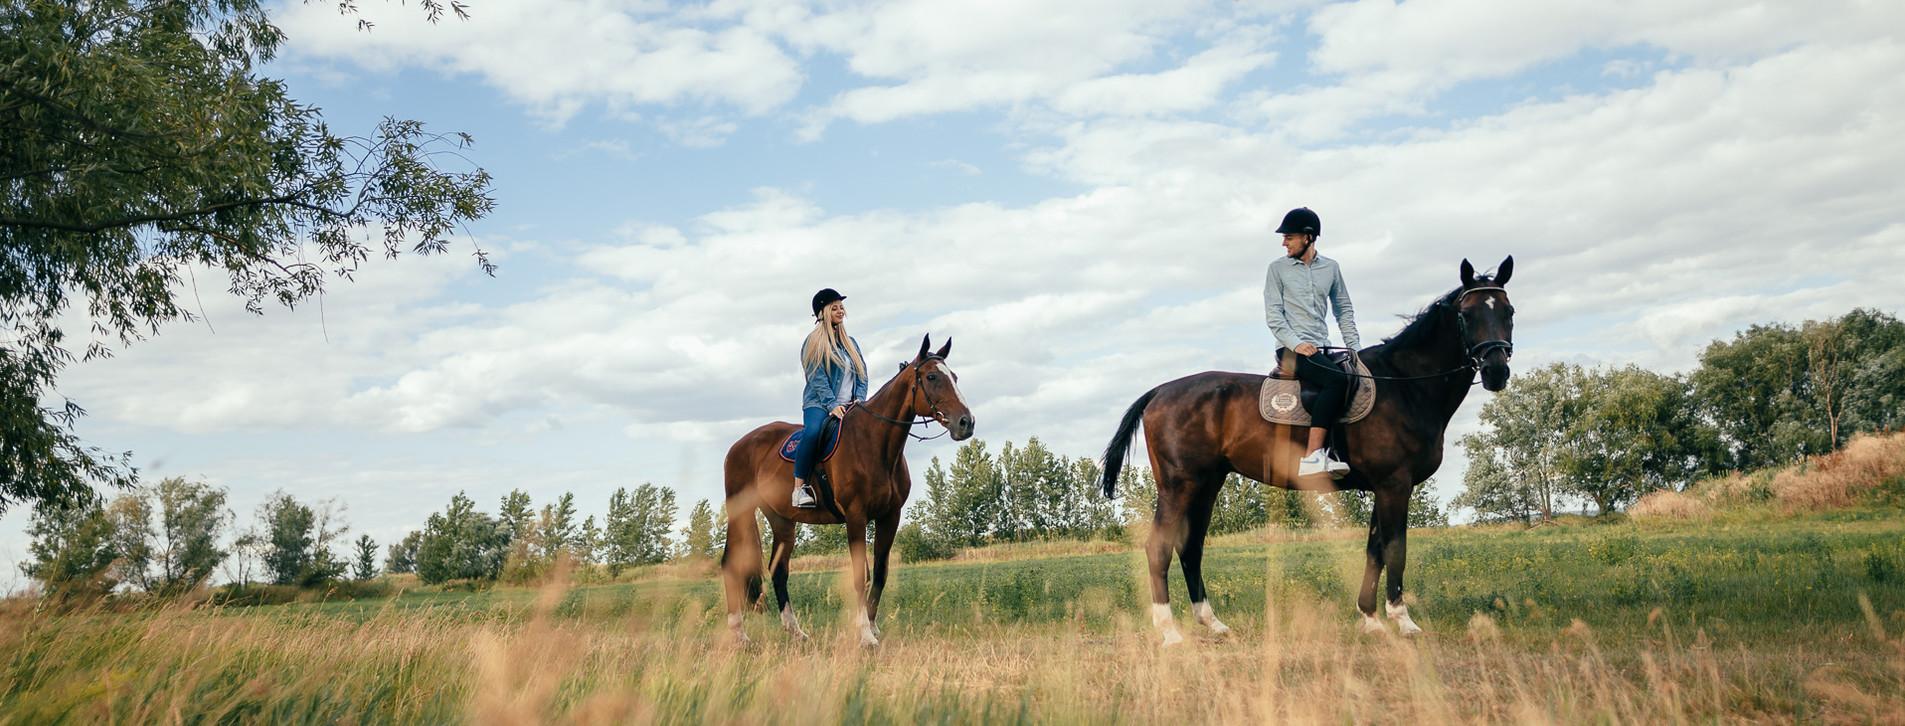 Фото 1 - Прогулка на лошадях для двоих Long